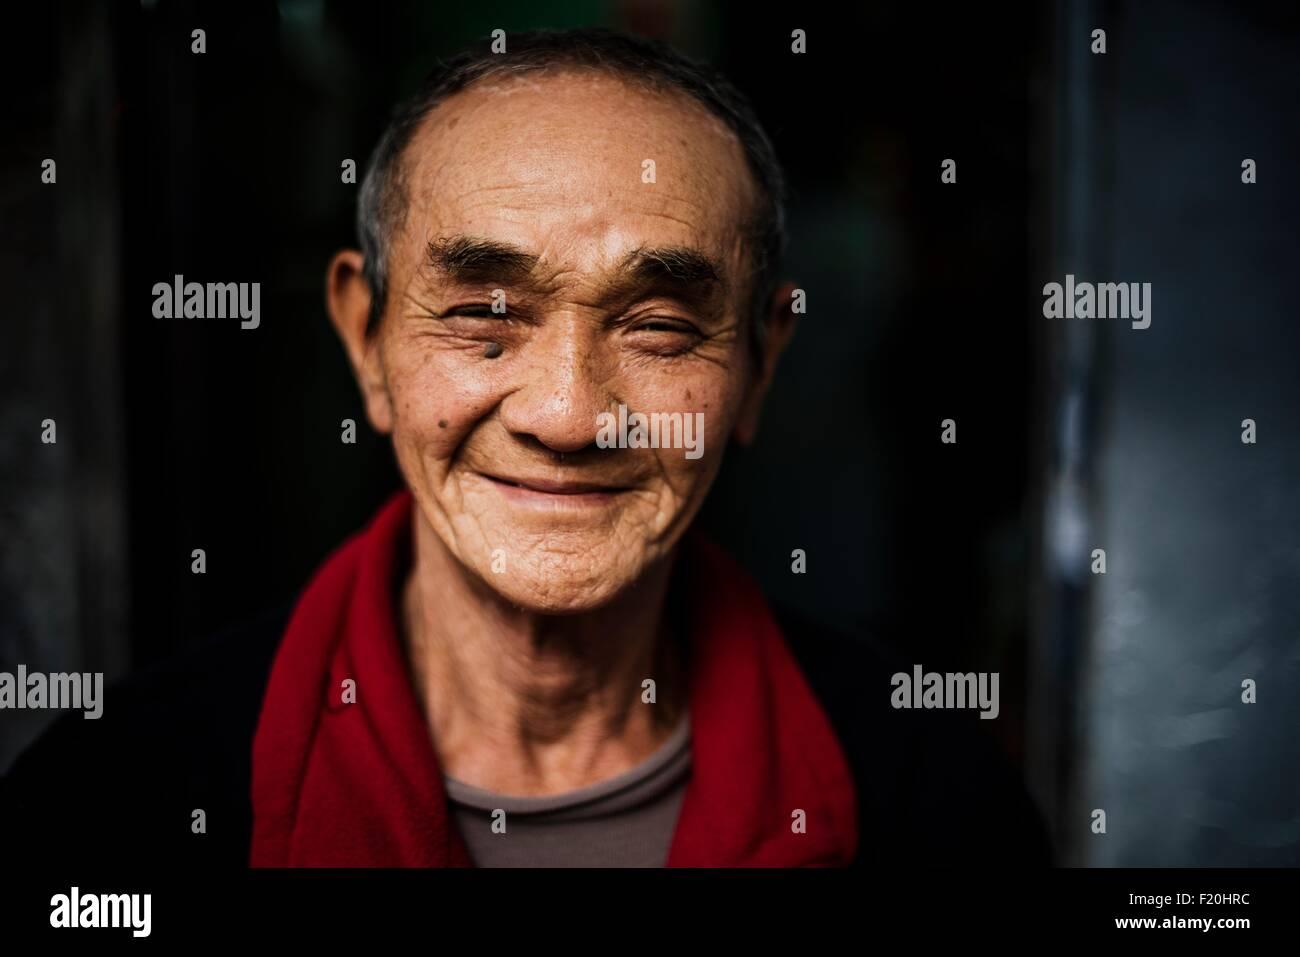 Portrait of senior man wearing red scarf around neck looking at camera smiling - Stock Image